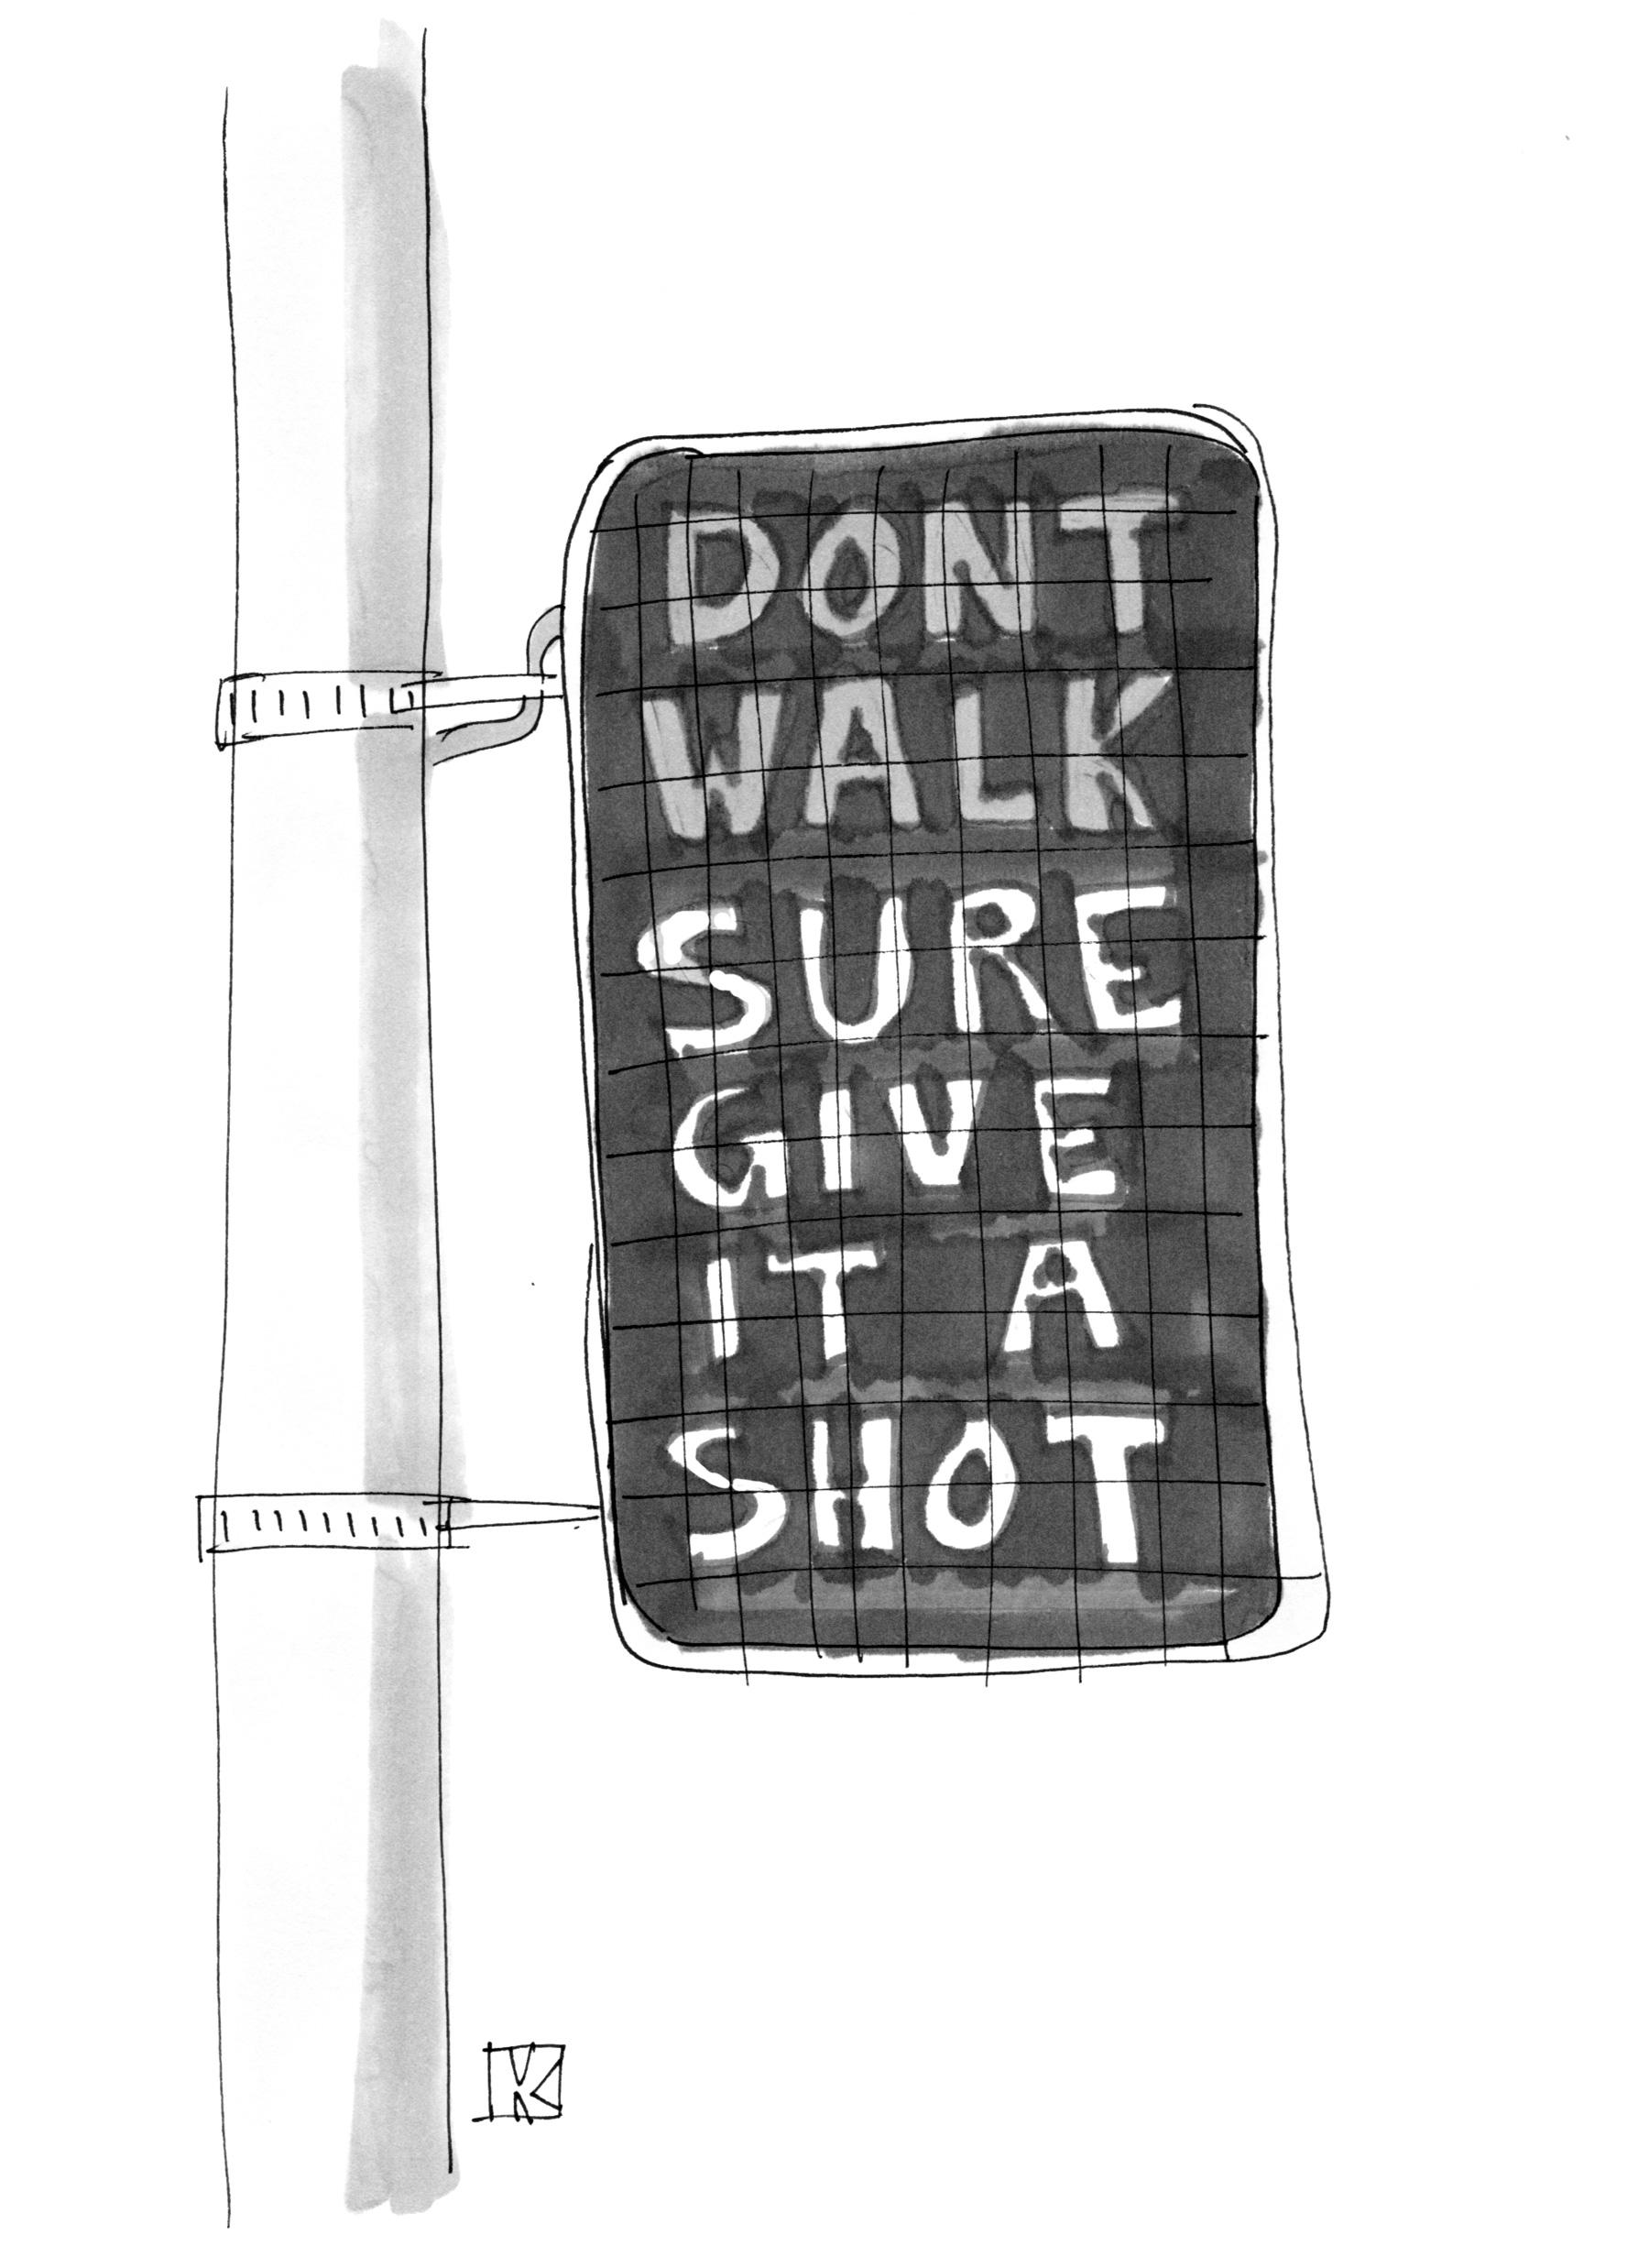 (Pedestrian traffic light displays: 'Don't Walk,' 'Sure, give it a shot.')